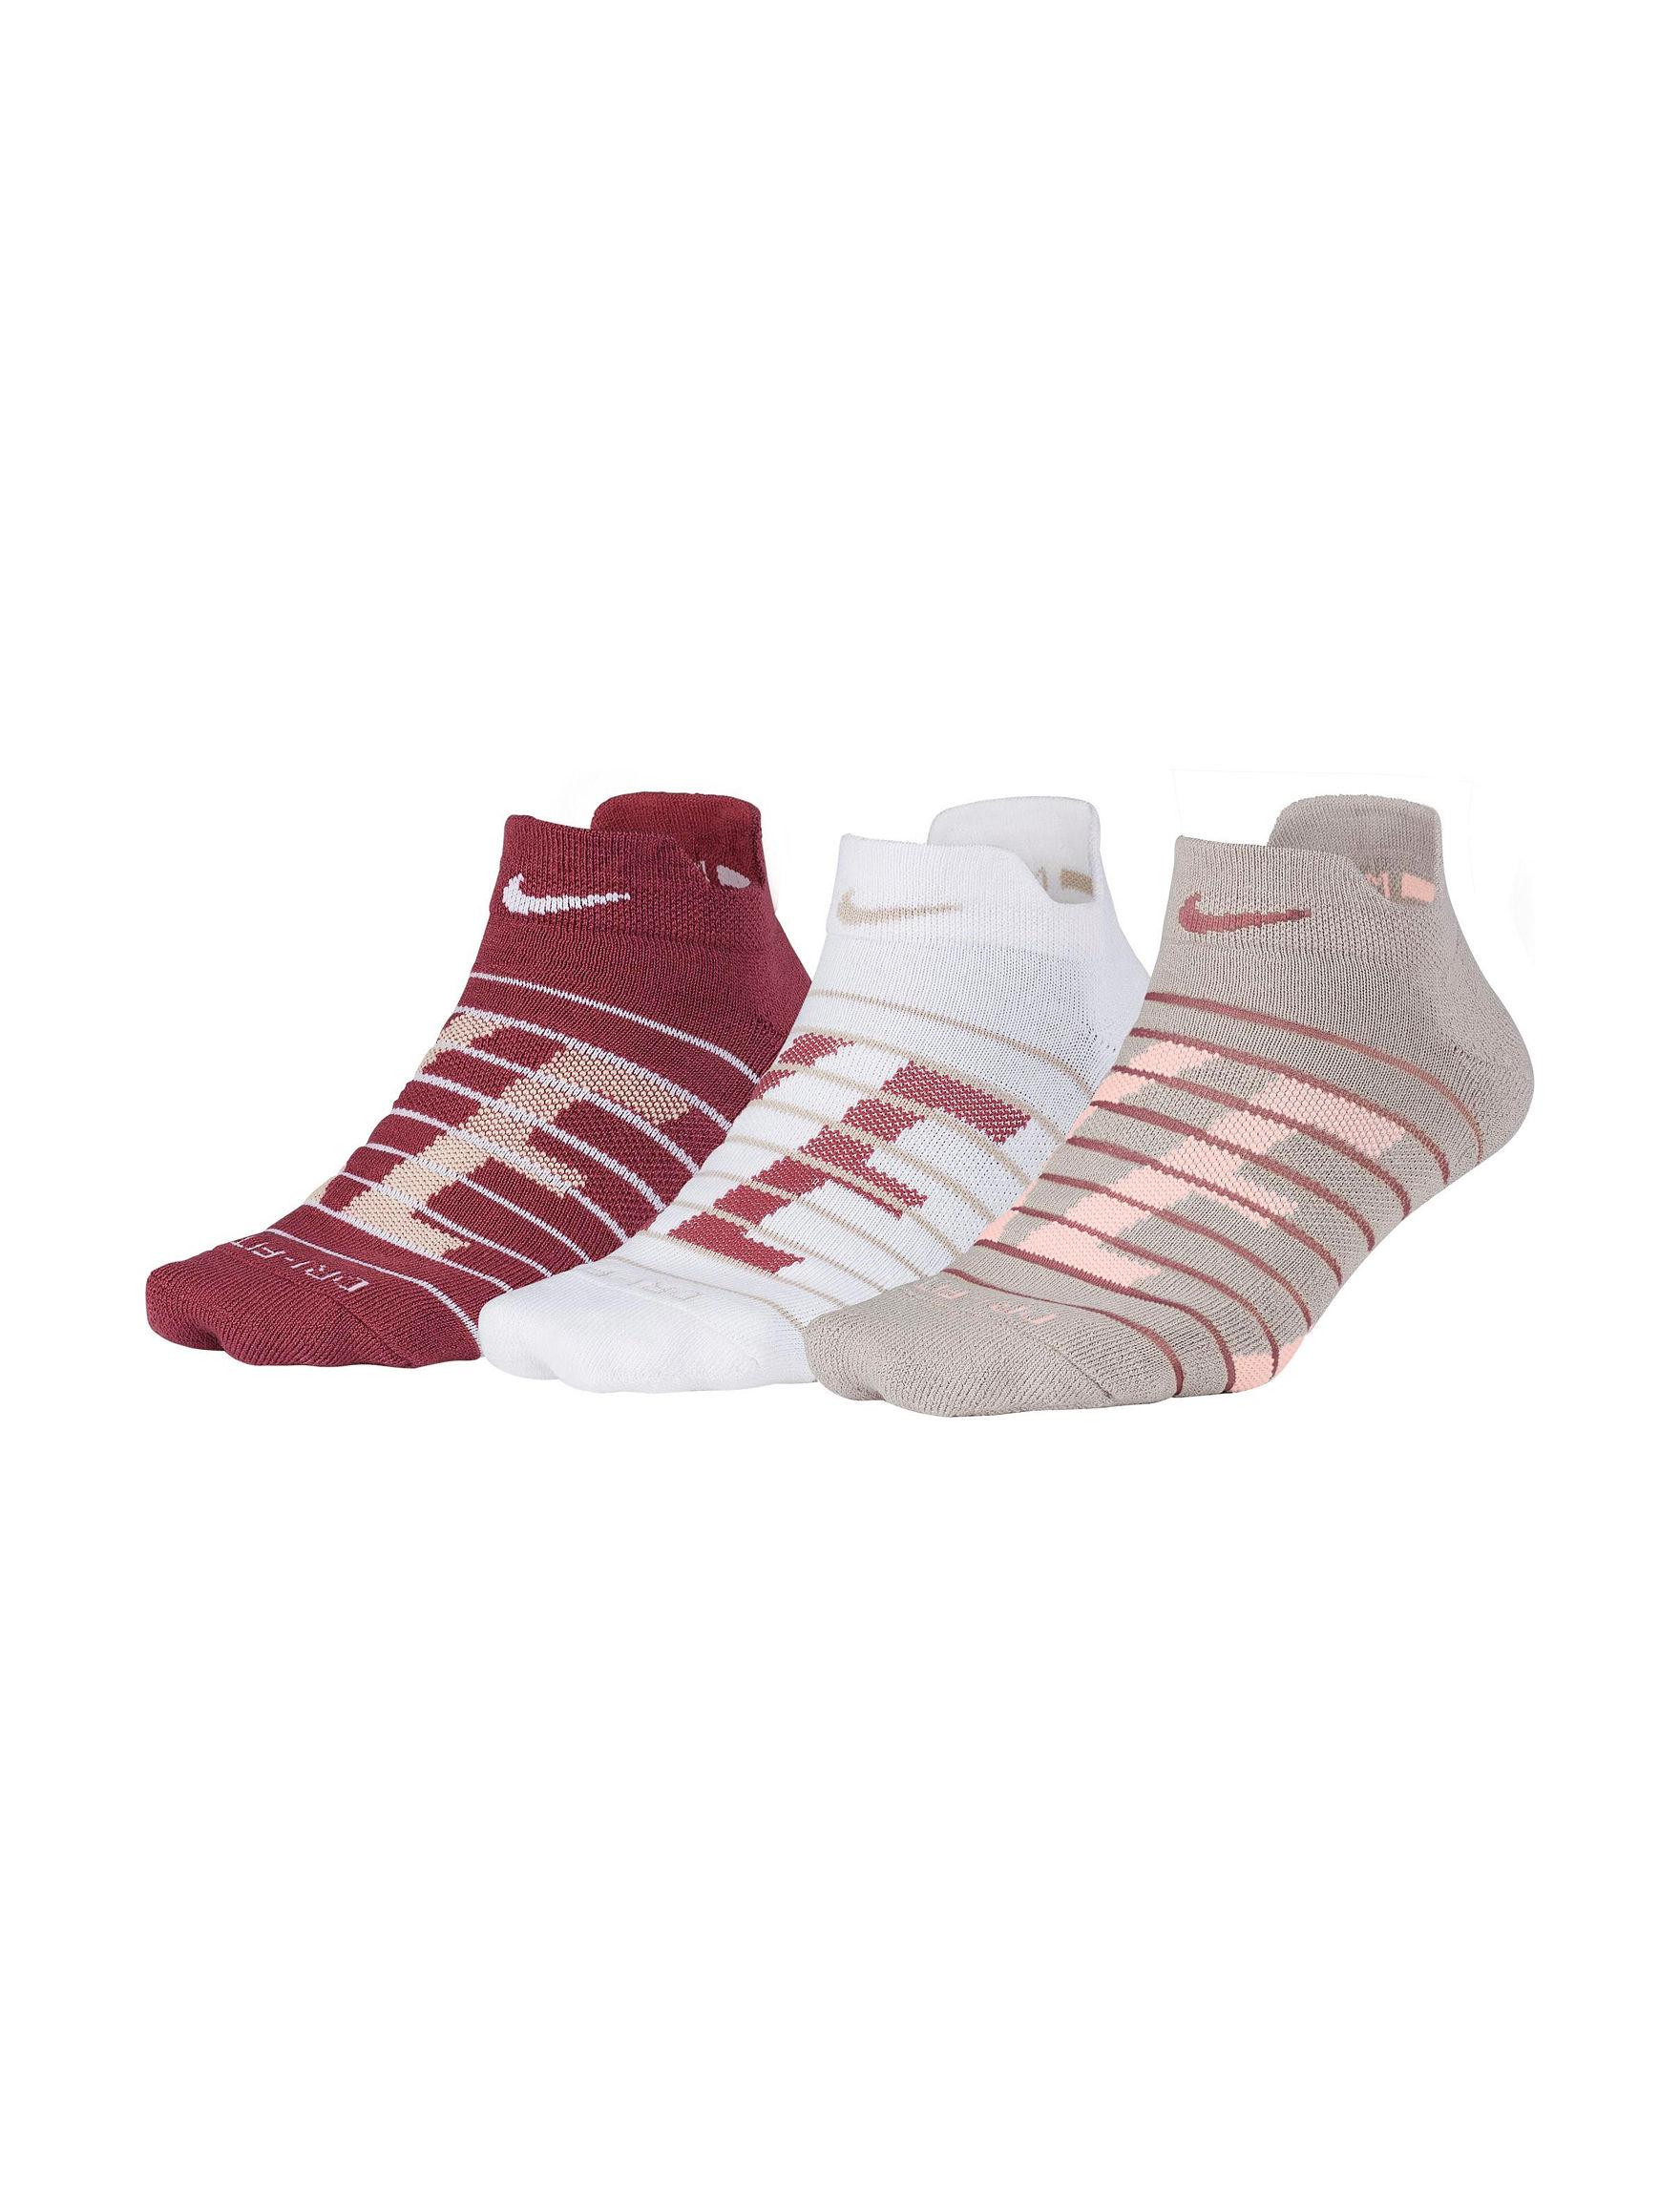 Nike Red Multi Socks